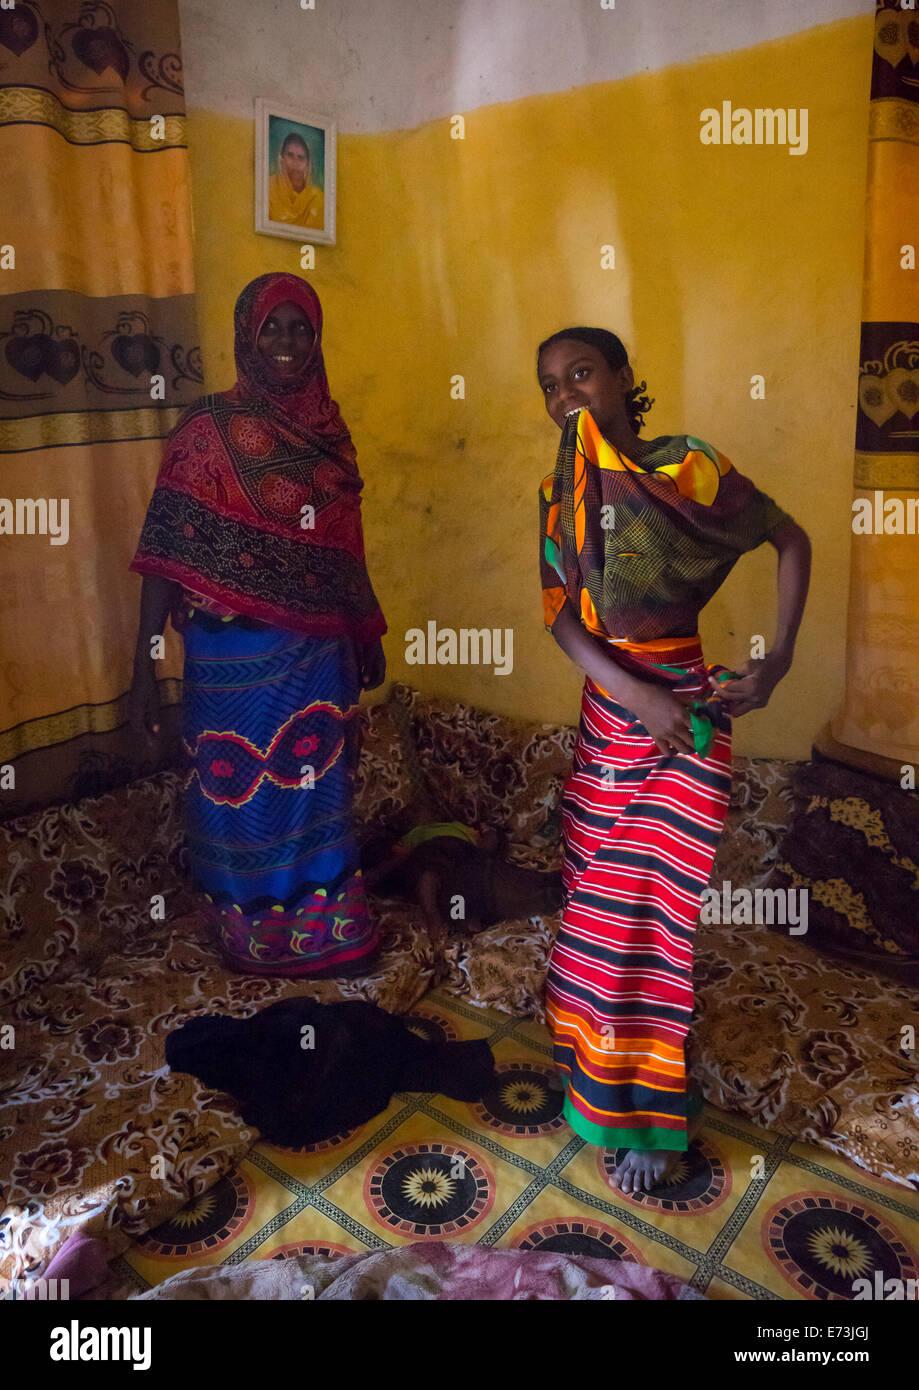 Fatouma Mahammed From Afar Tribe Afambo, Ethiopia - Stock Image